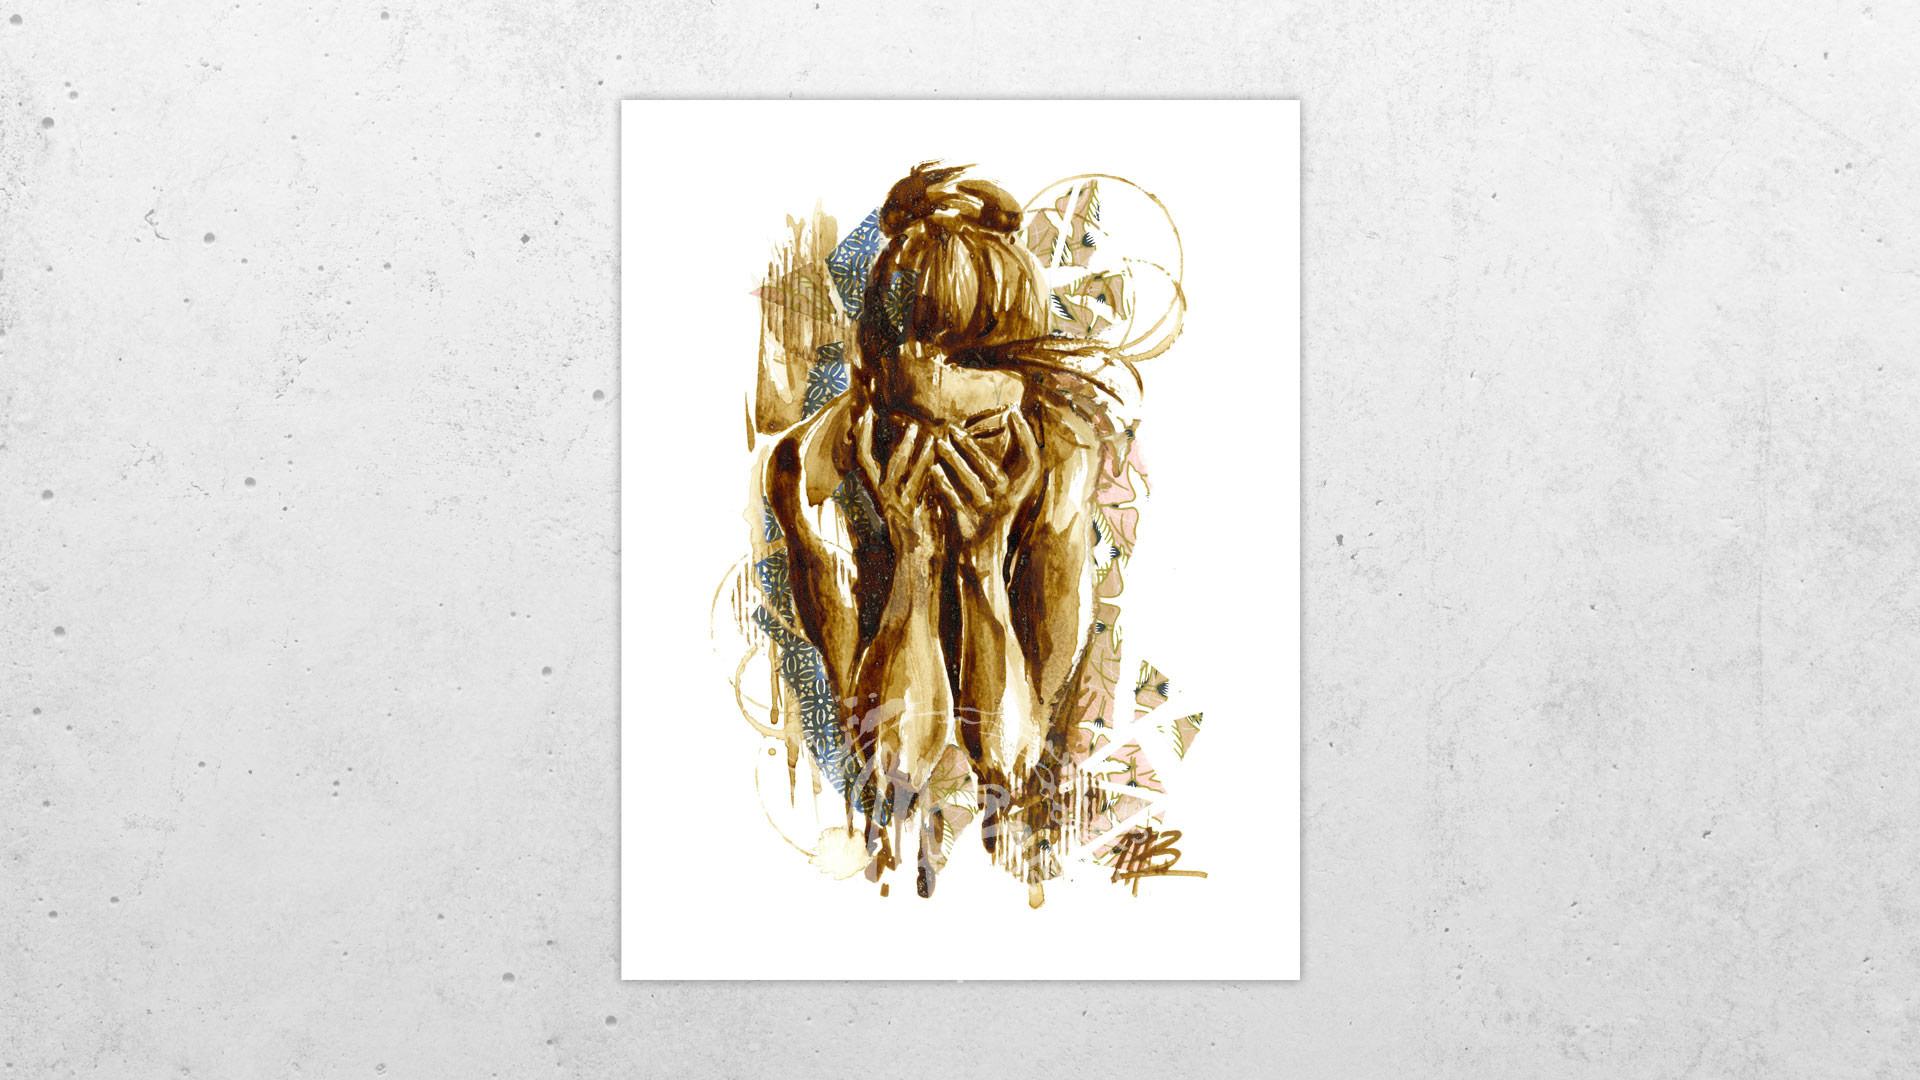 Weeping-Porfolio-Watermarked